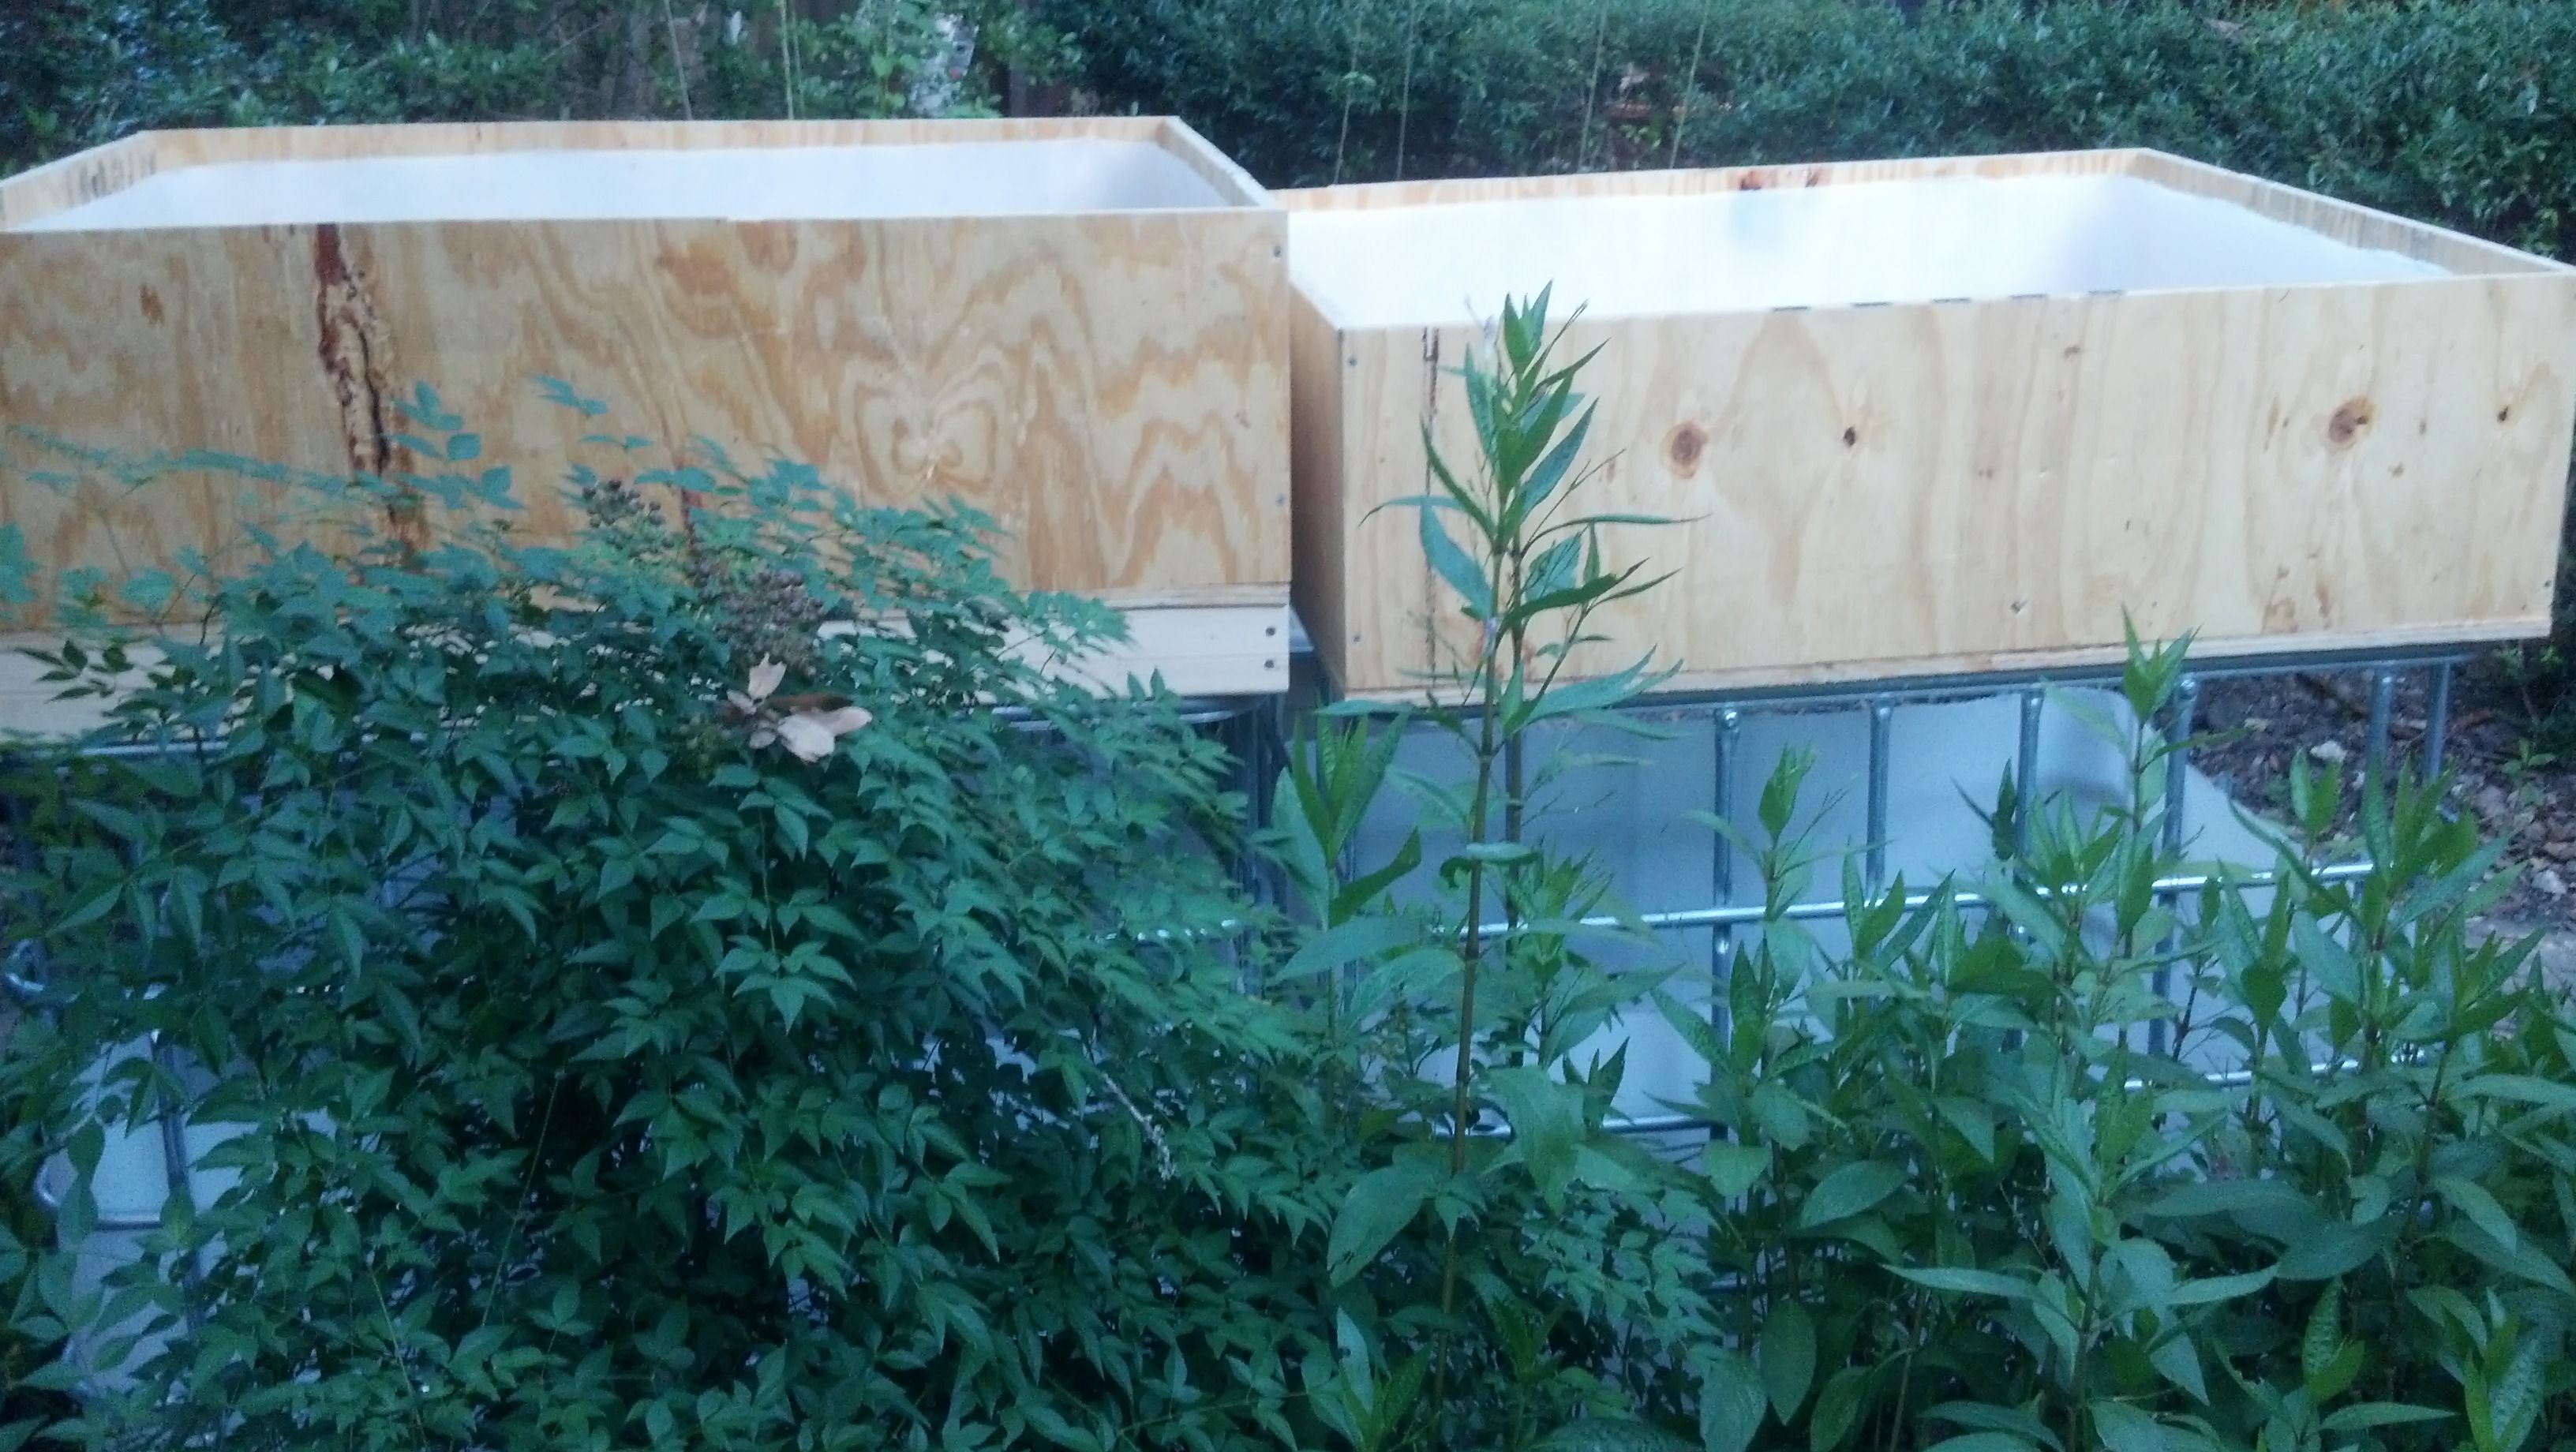 Diy aquaponics wood grow beds | Aquaponics, Garden beds ...